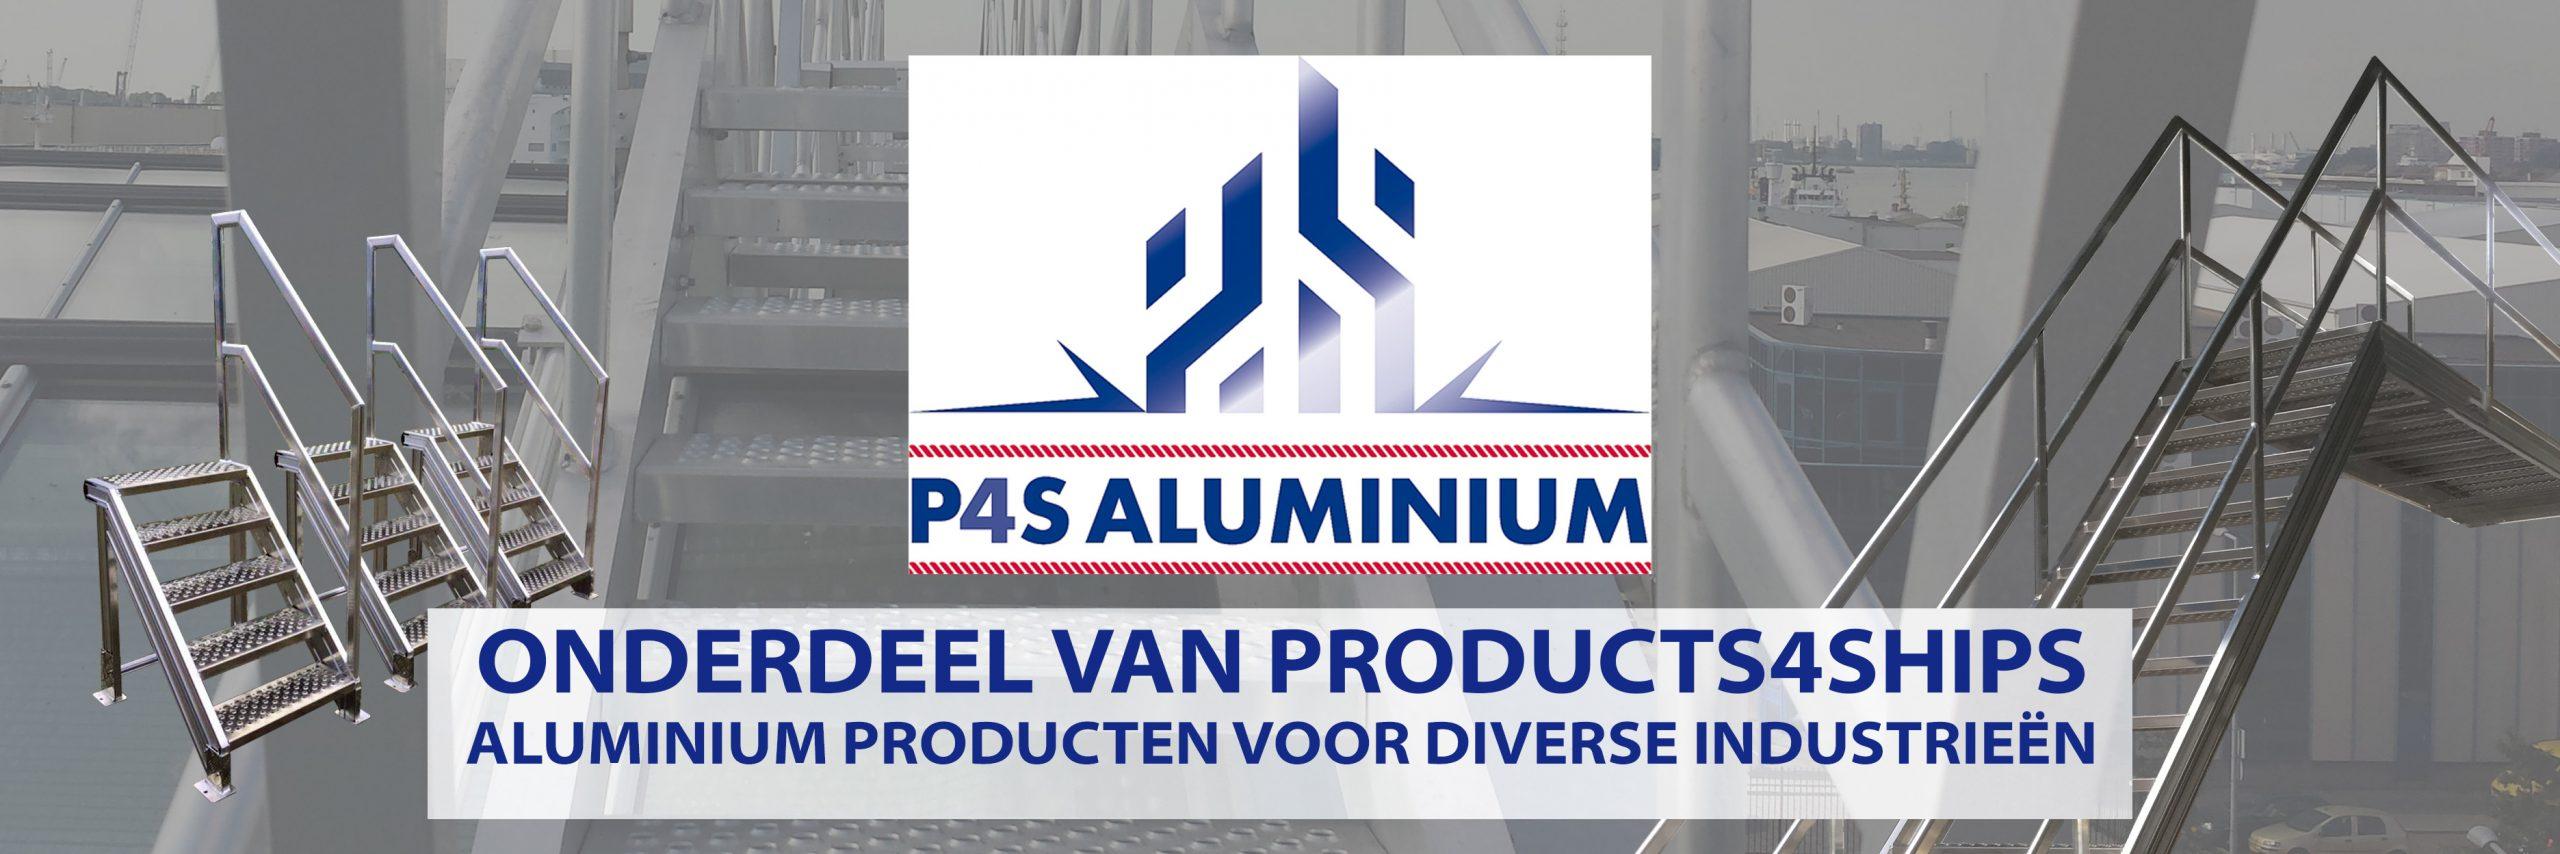 P4S Aluminium producten